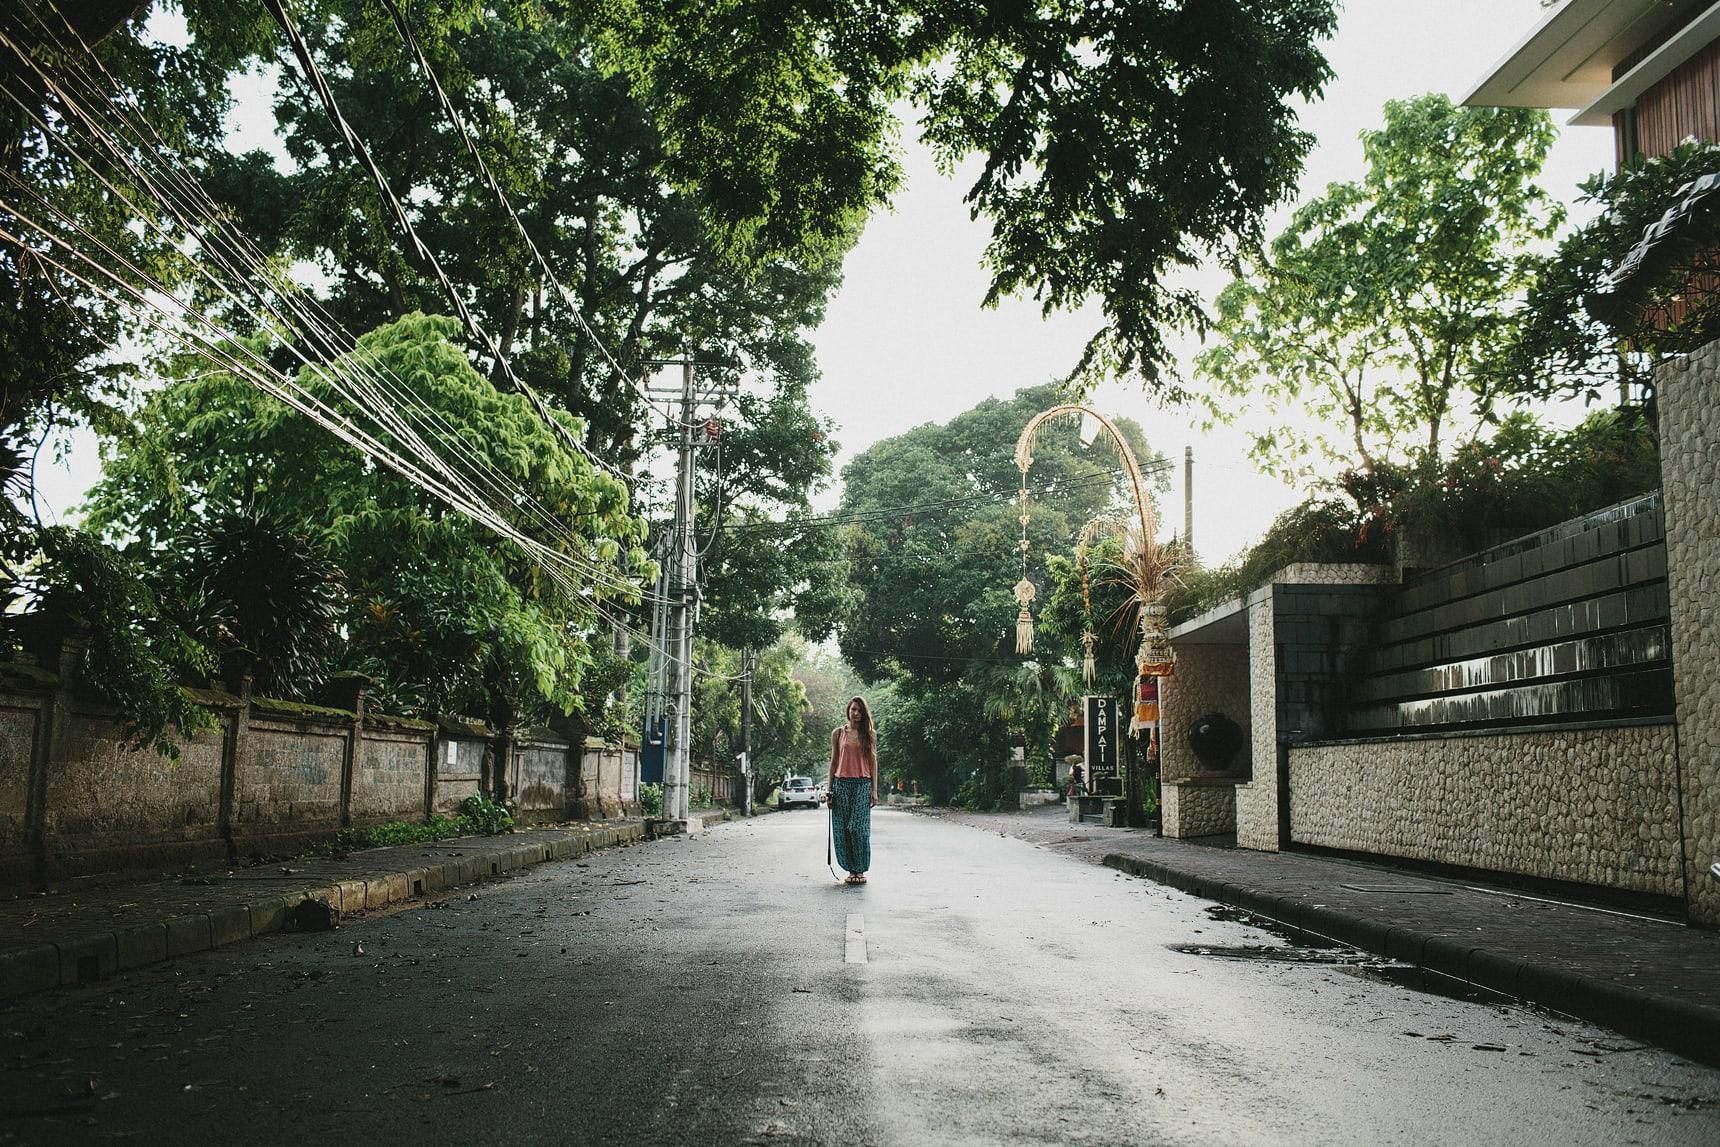 bali travel photography